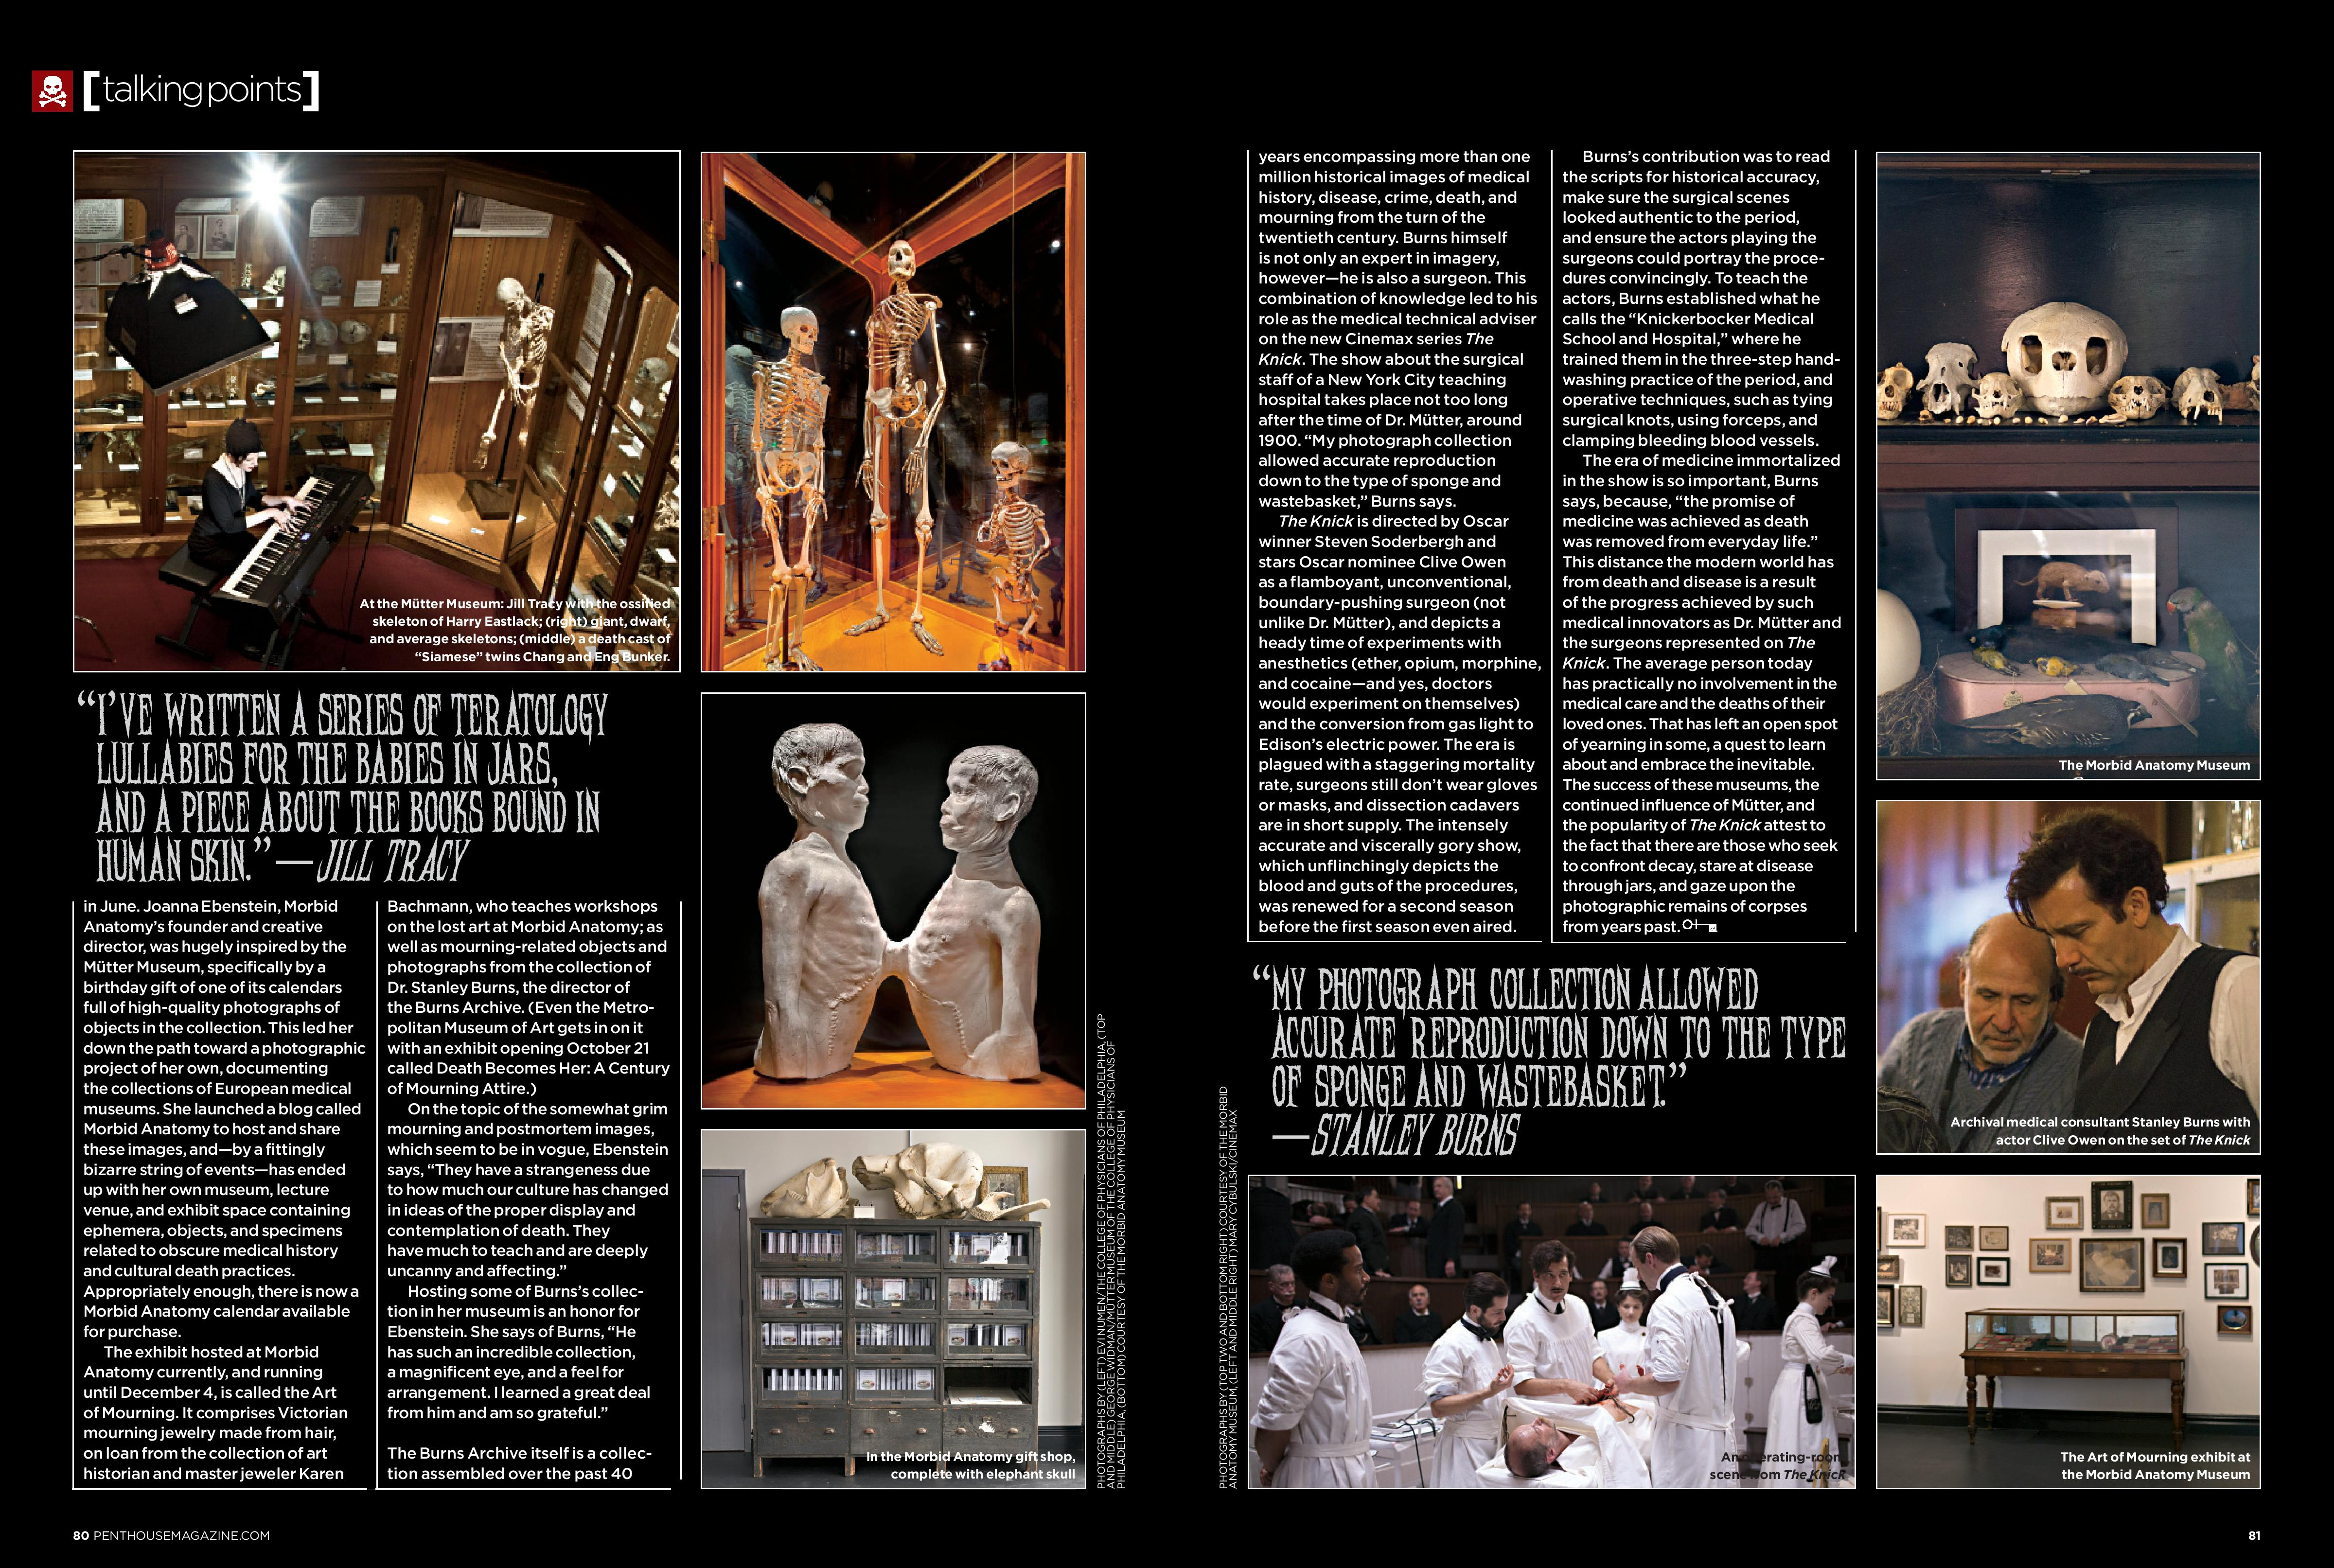 The Morbid Anatomy Museum – christine colby